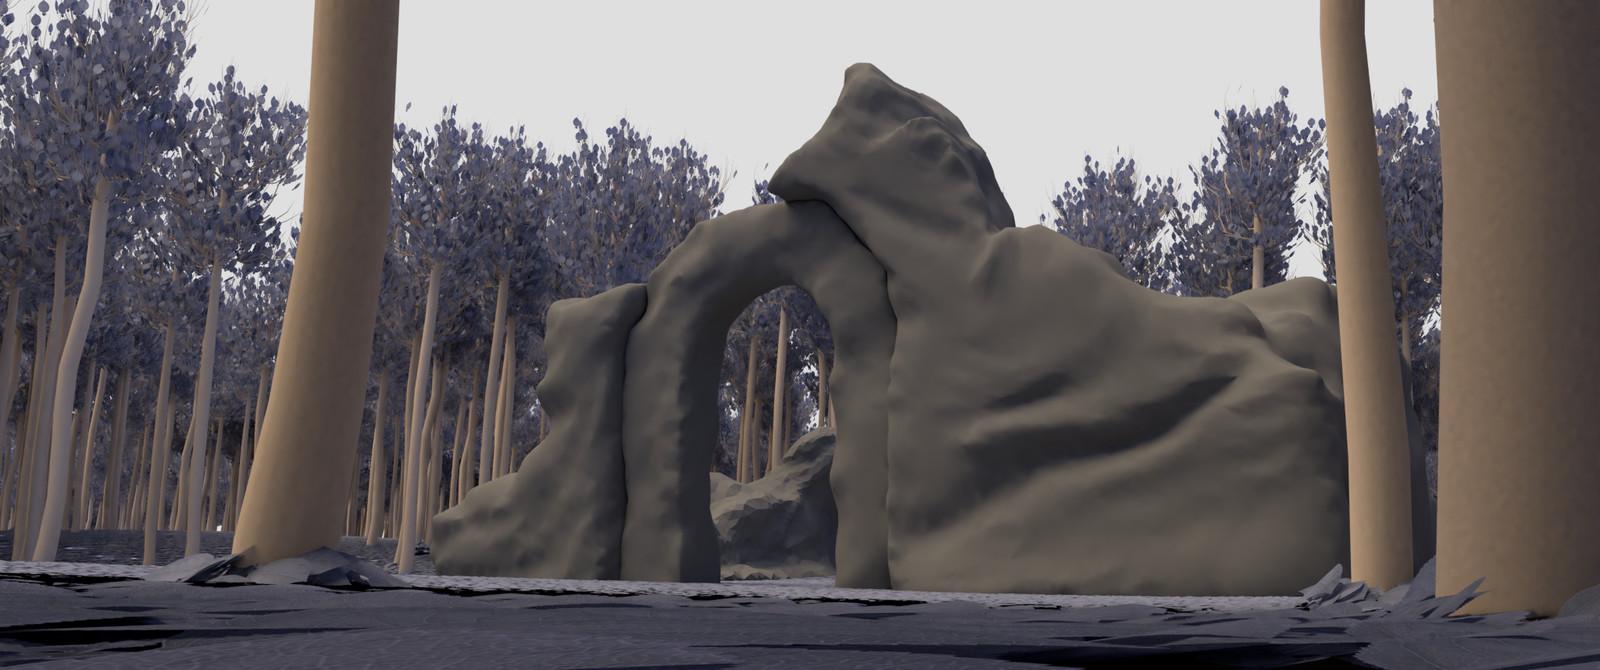 The Archway Blockmesh